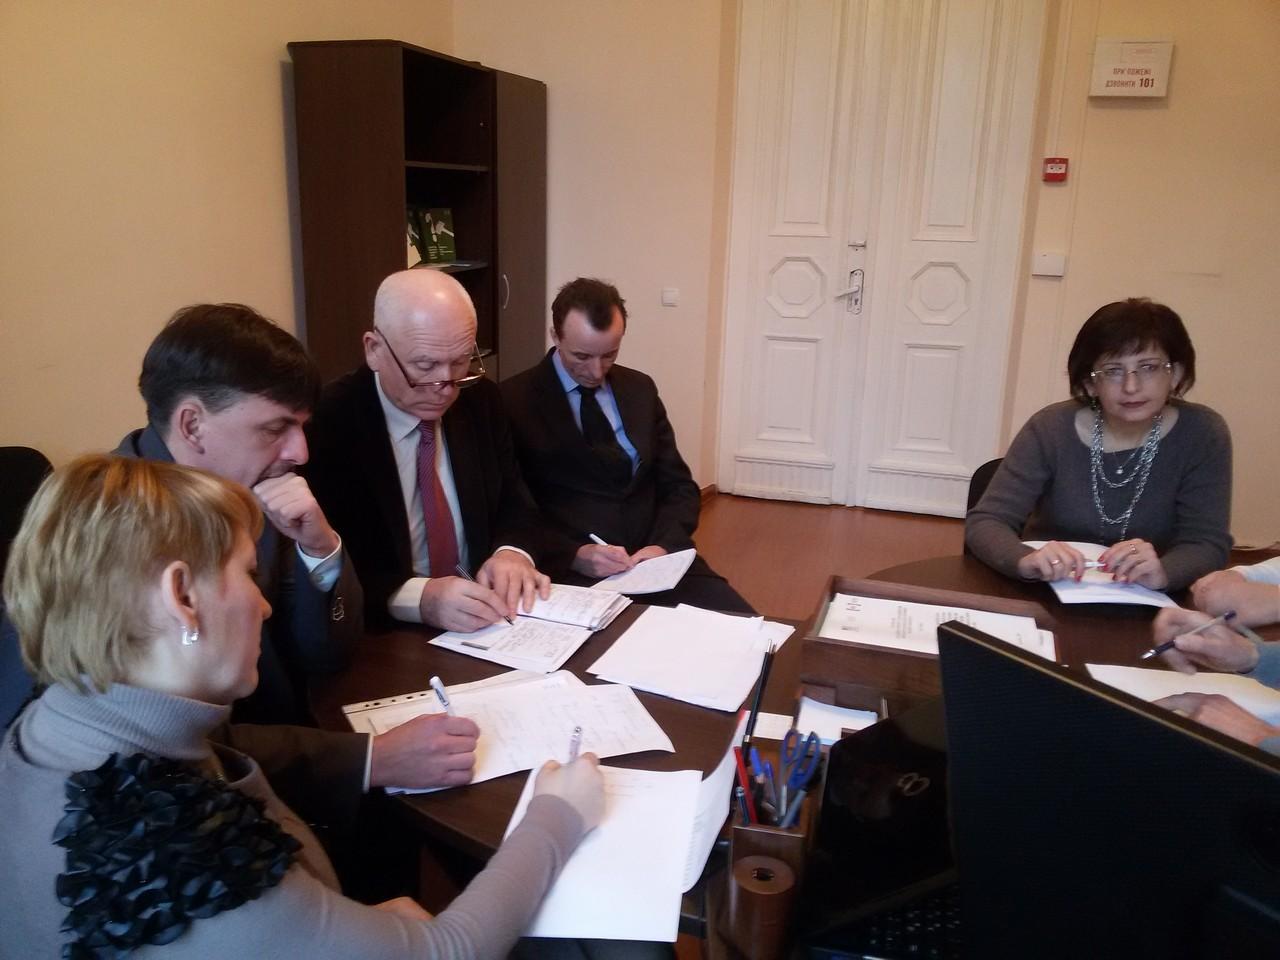 23.12.2015 board meeting 3